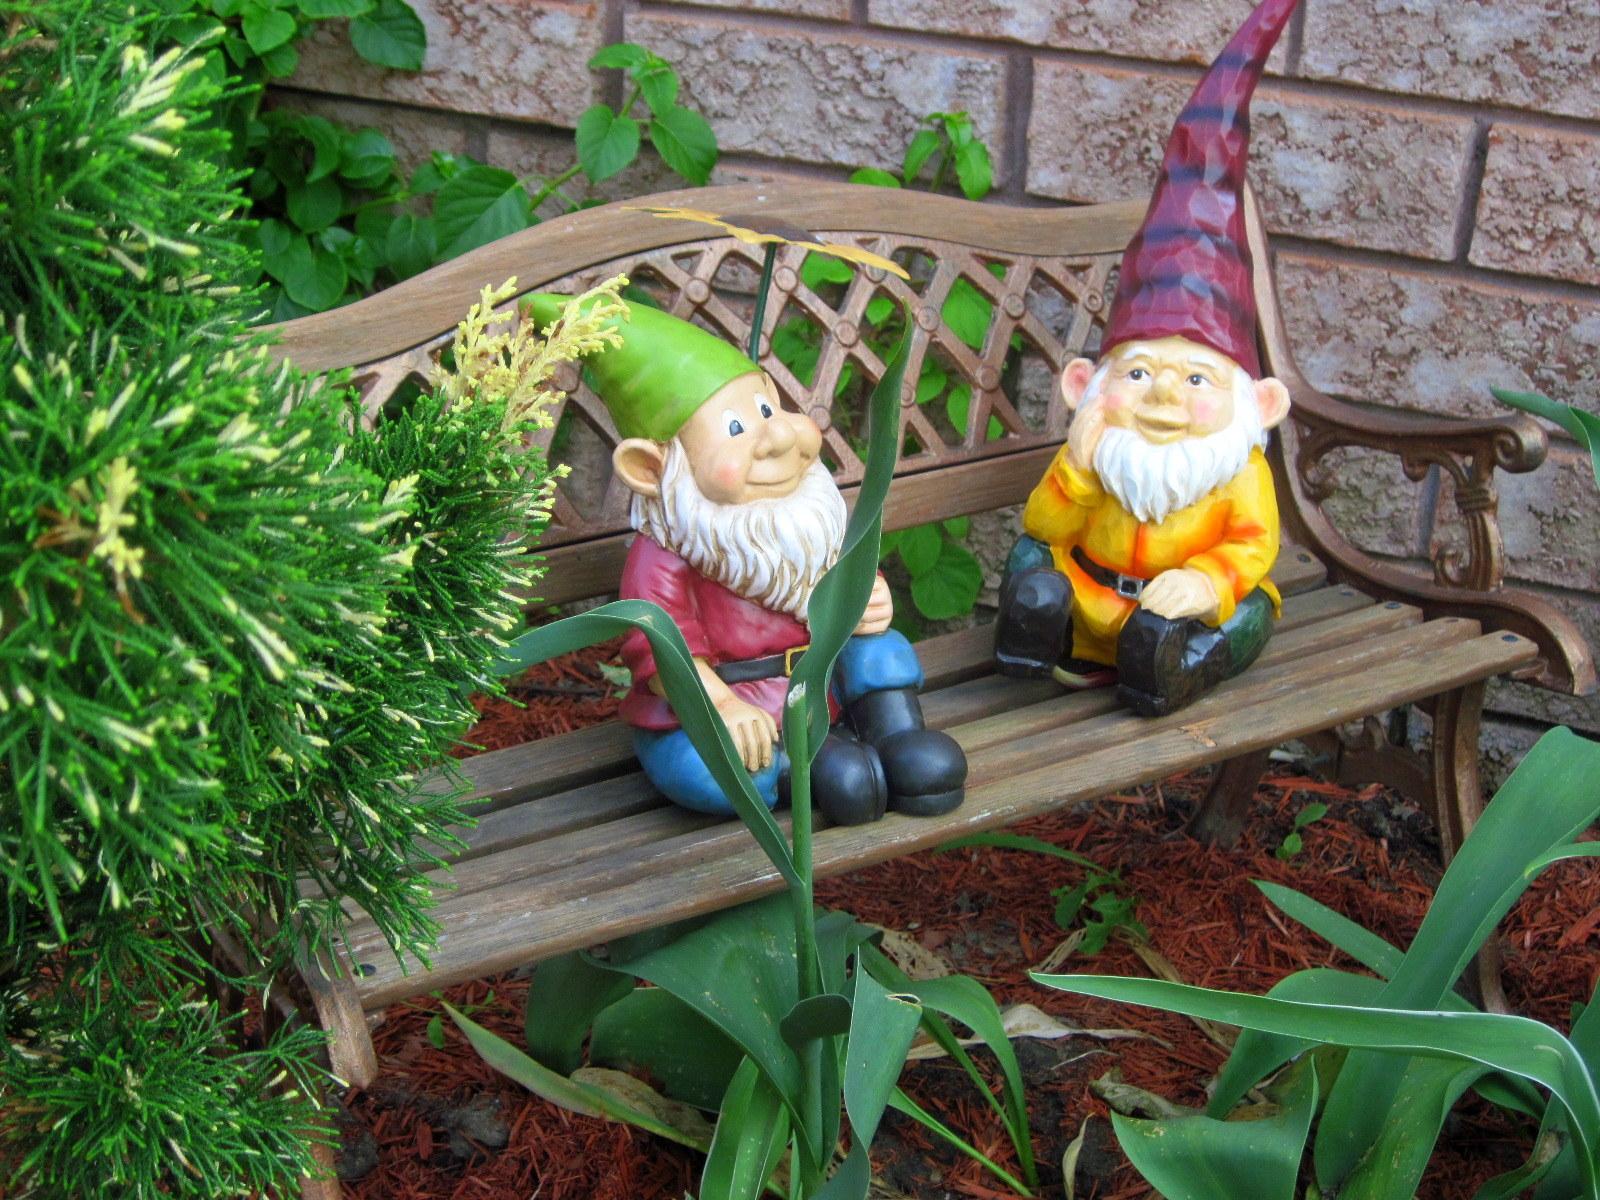 Gnome 4: Robin's Ramblings: Gnome Man's Land